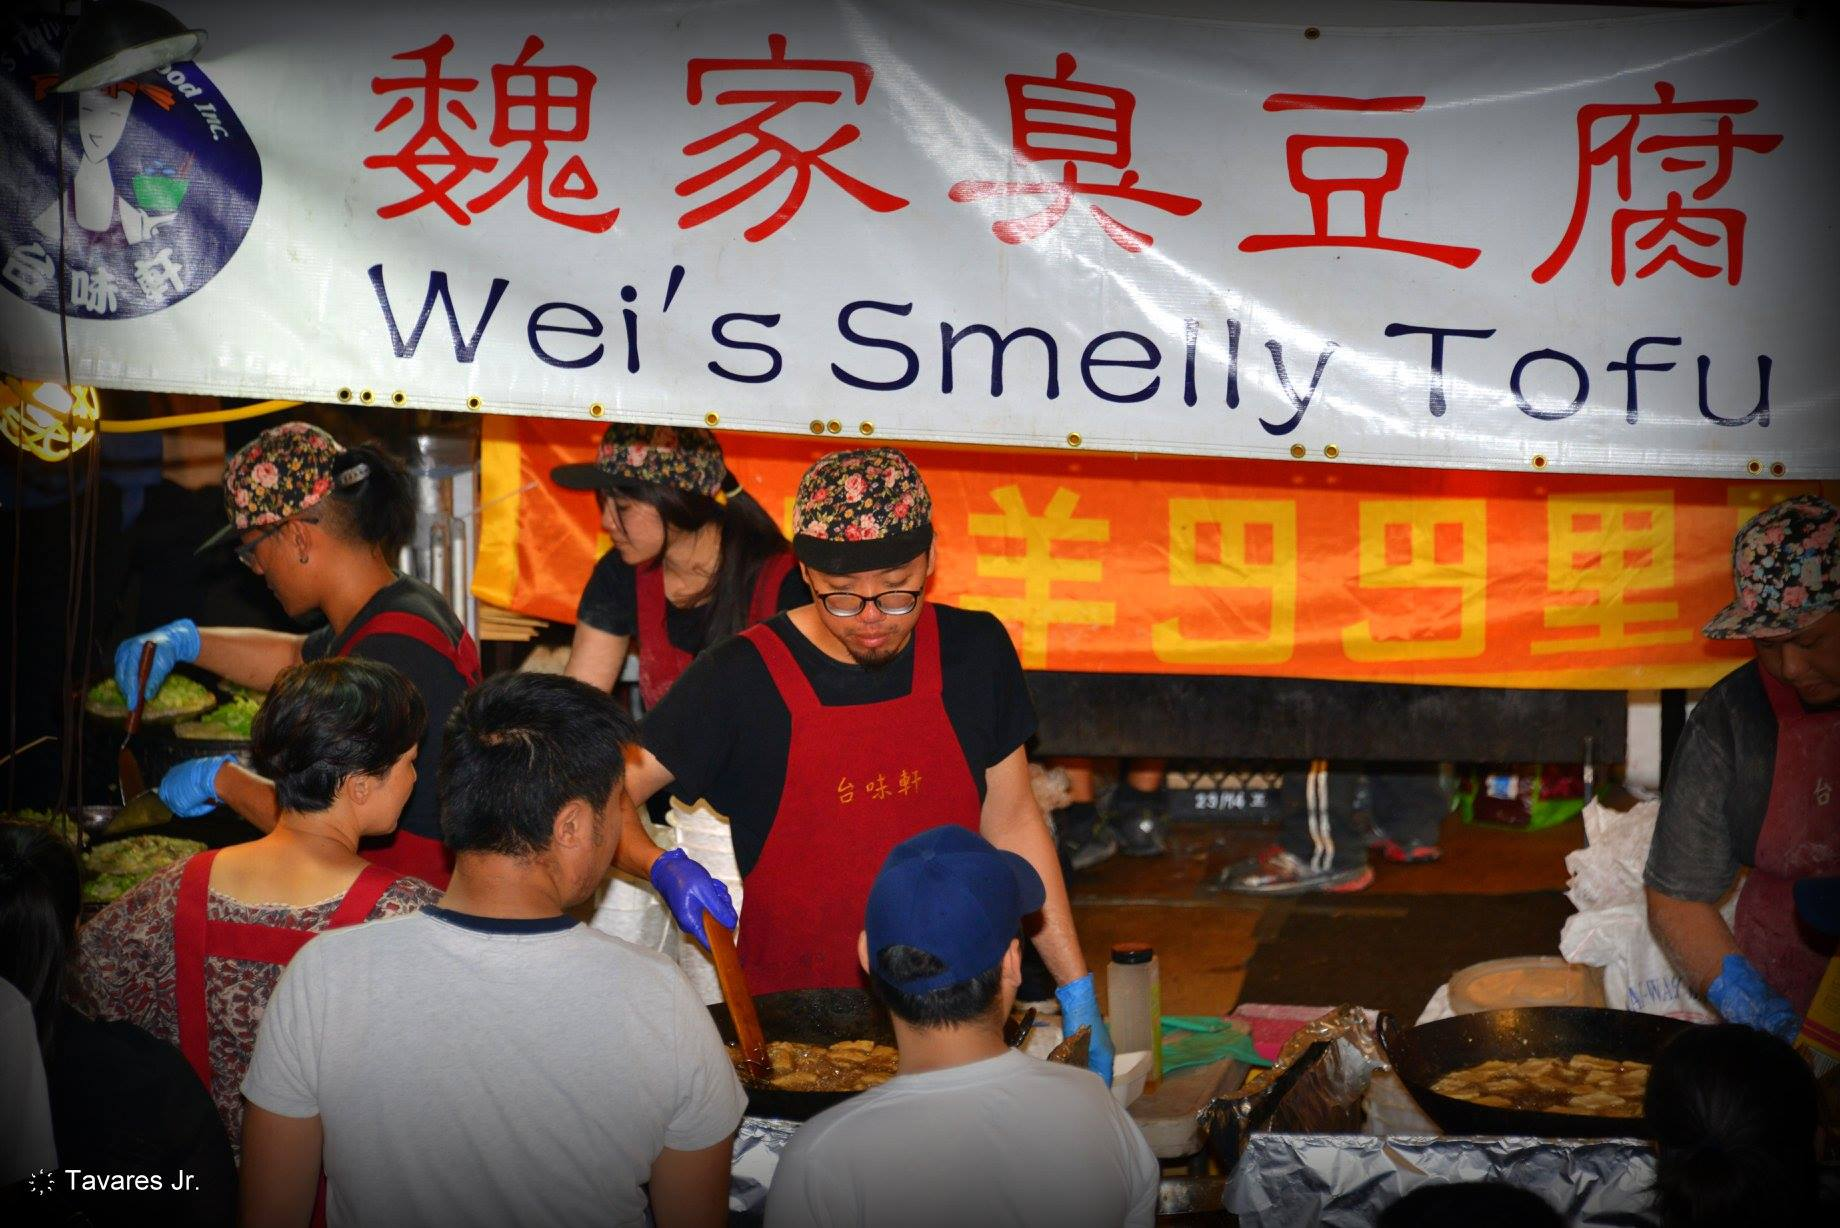 Waterfront Night Market smelly tofu